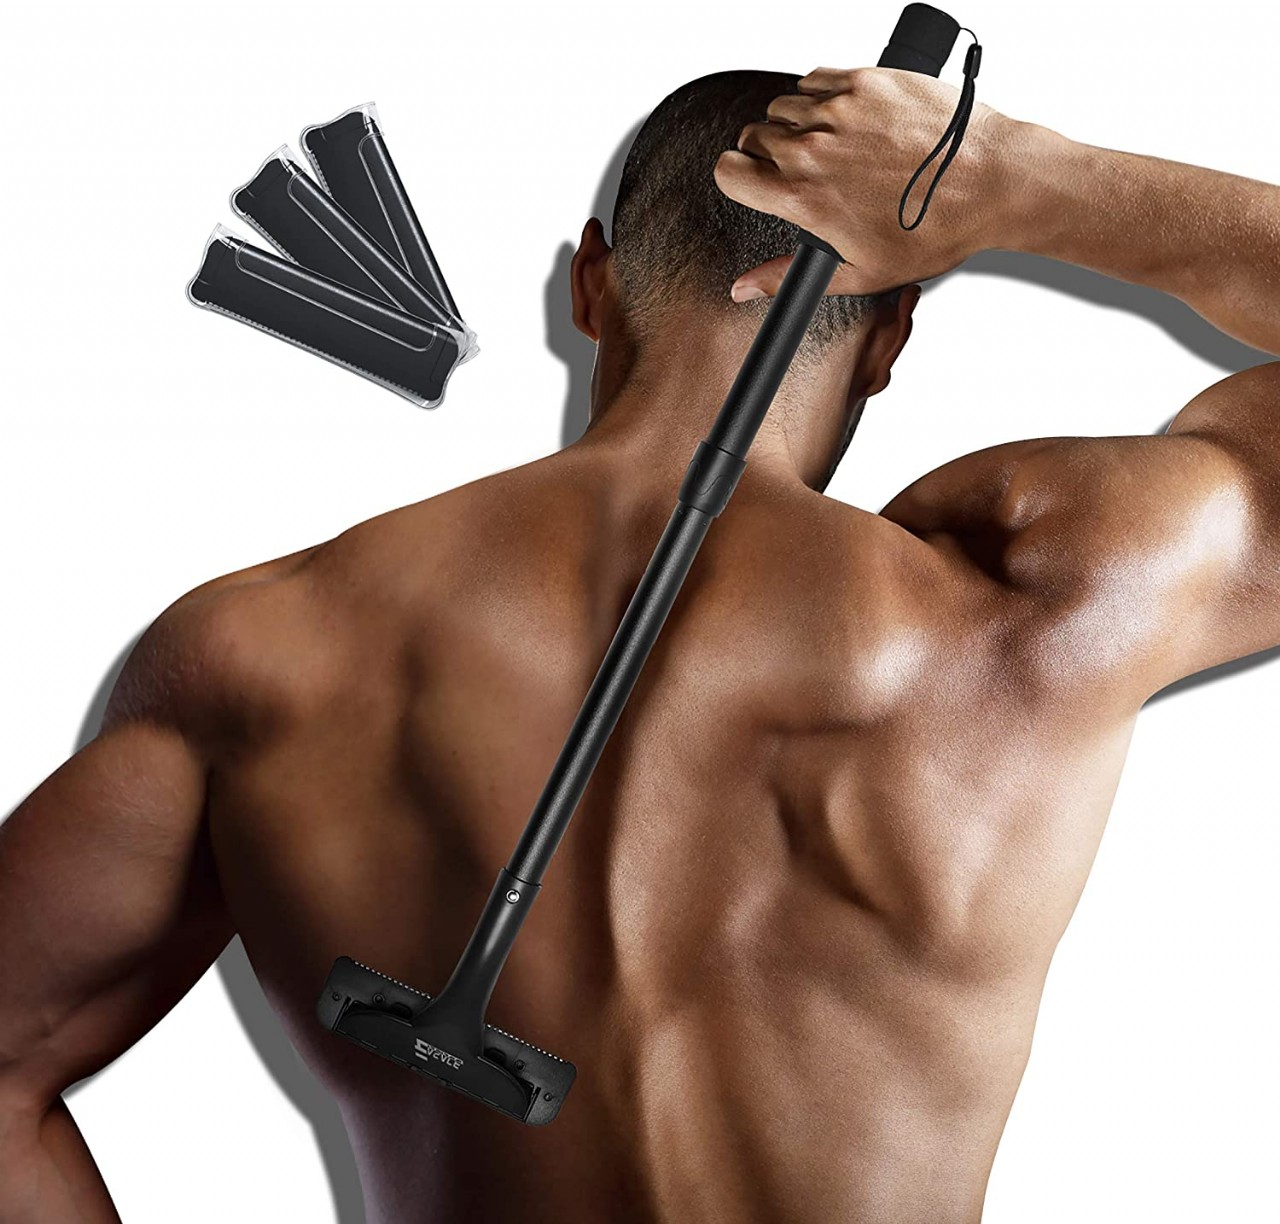 EASACE Back Shaver Back Hair Removal for Men, Back Groomer with Long Handle 21.5 Inch Adjustable